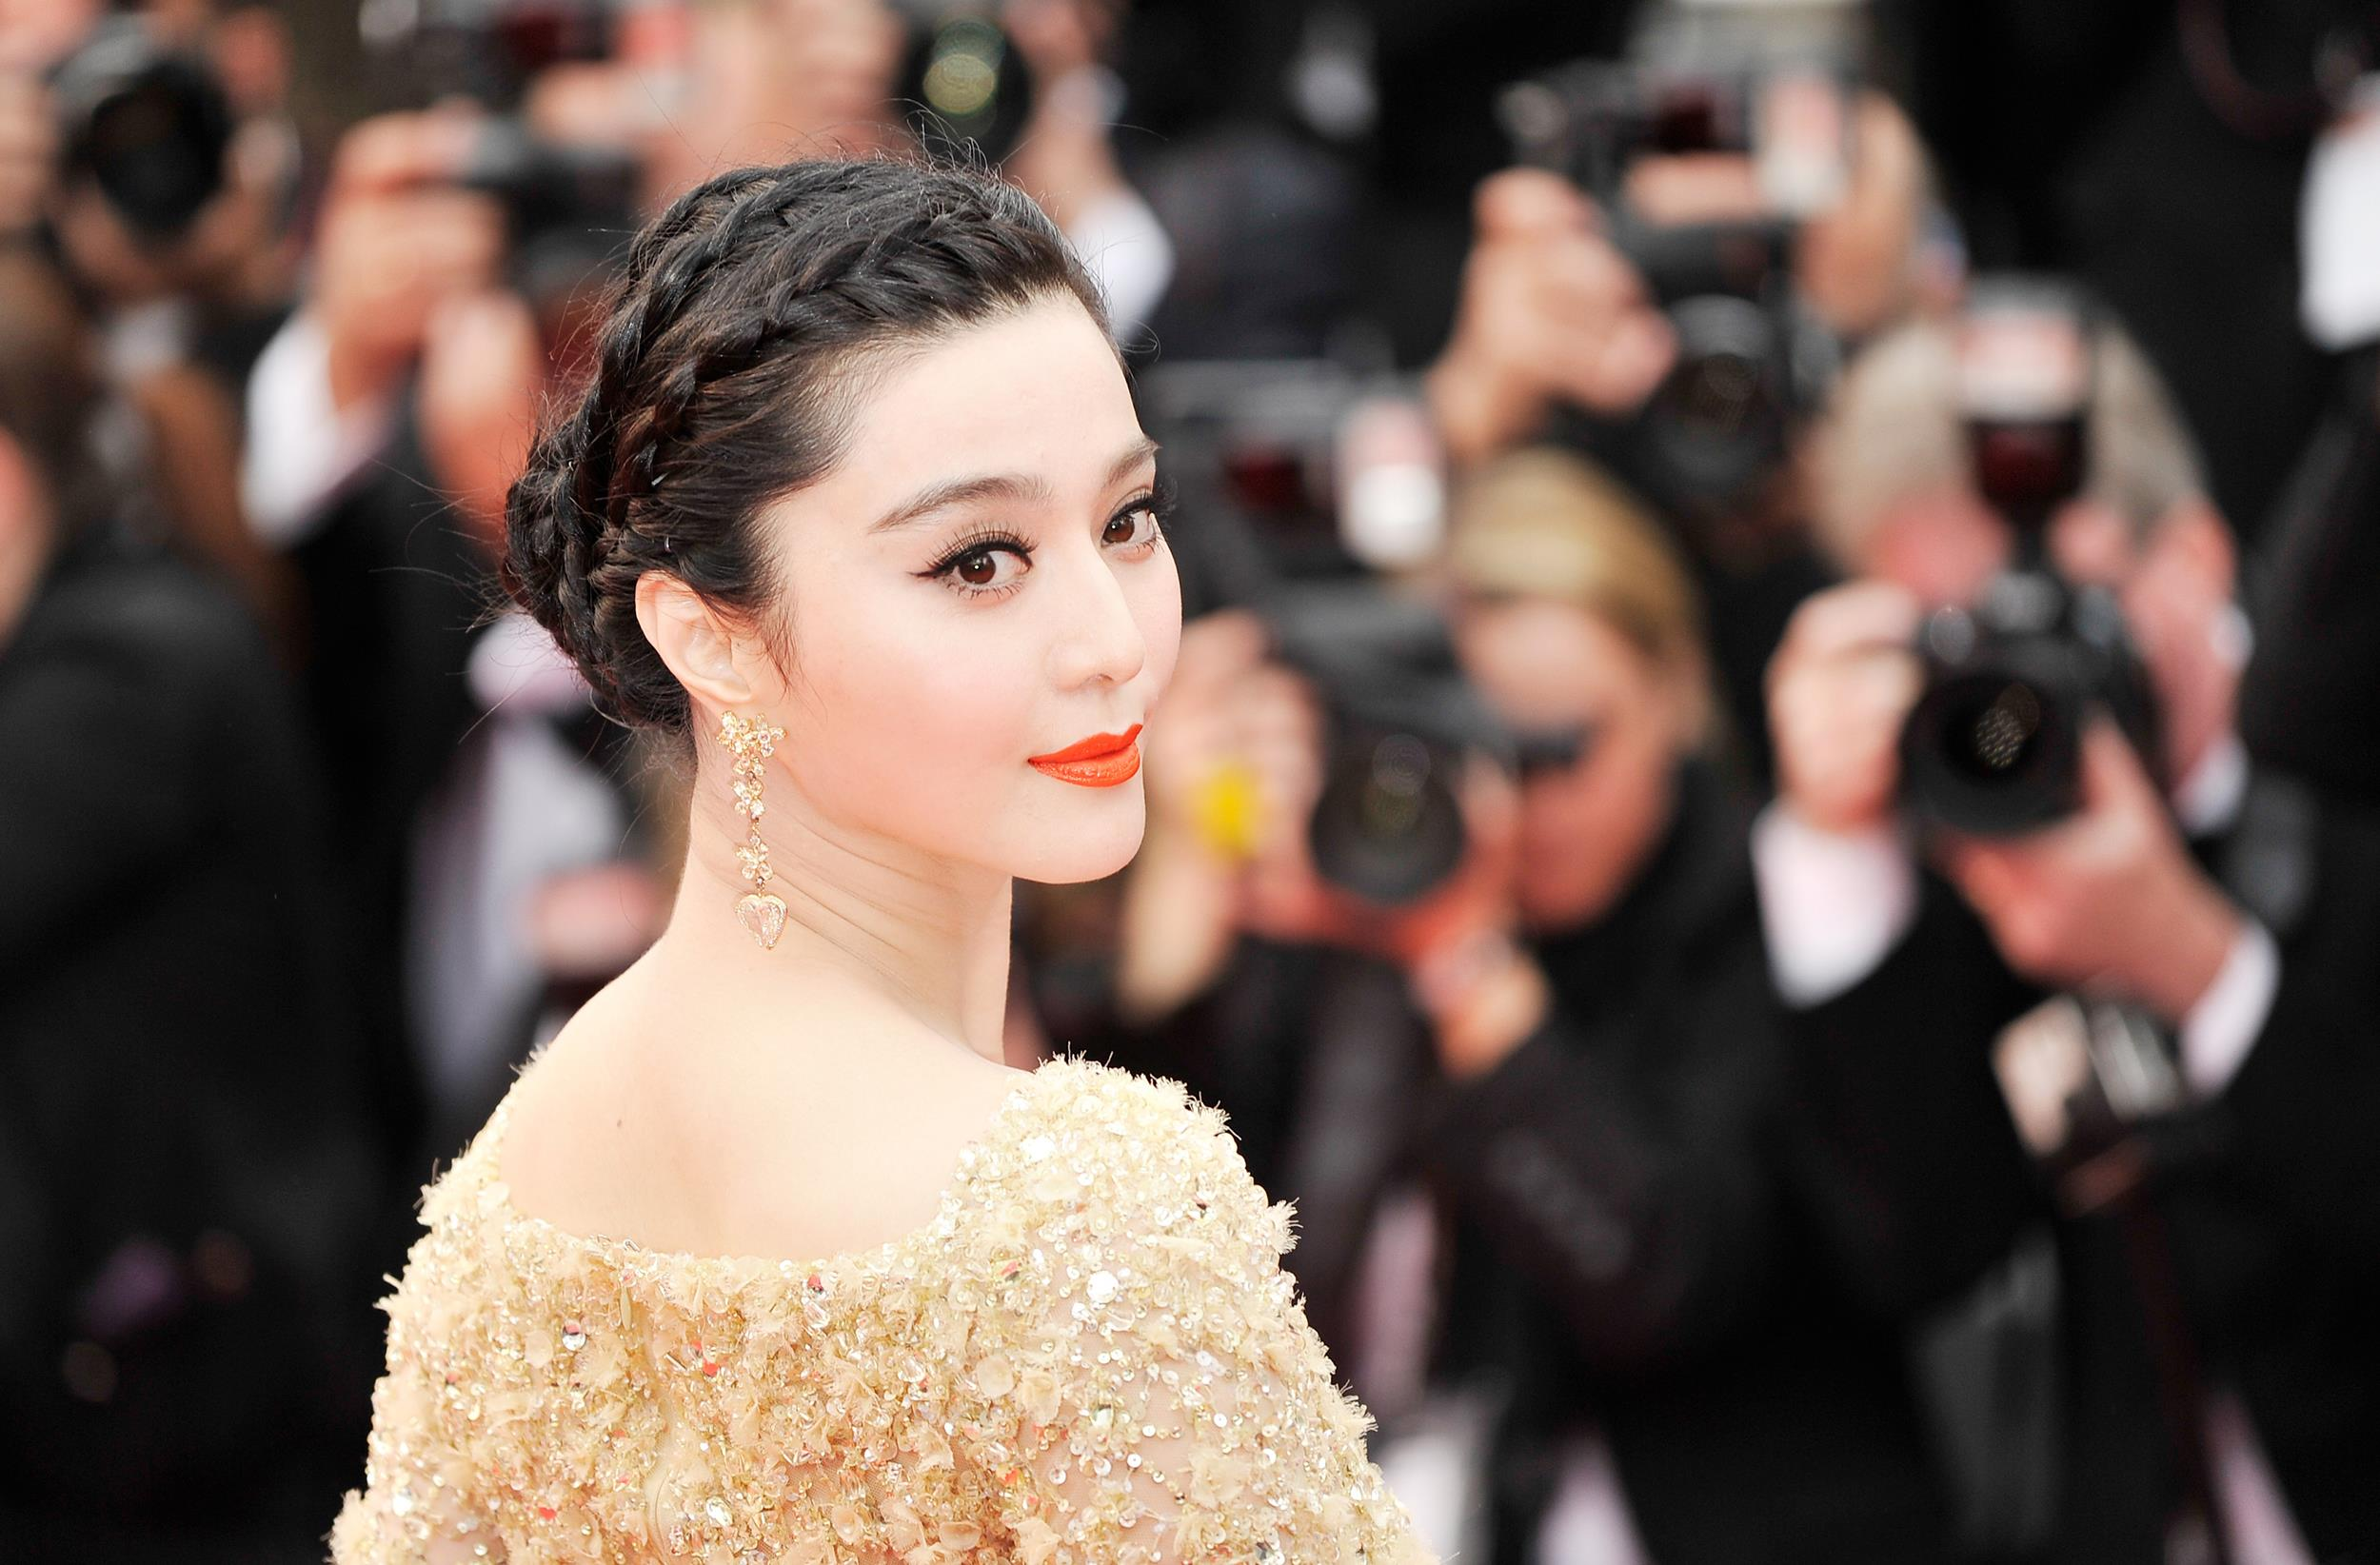 Image: Actress Fan Bingbing